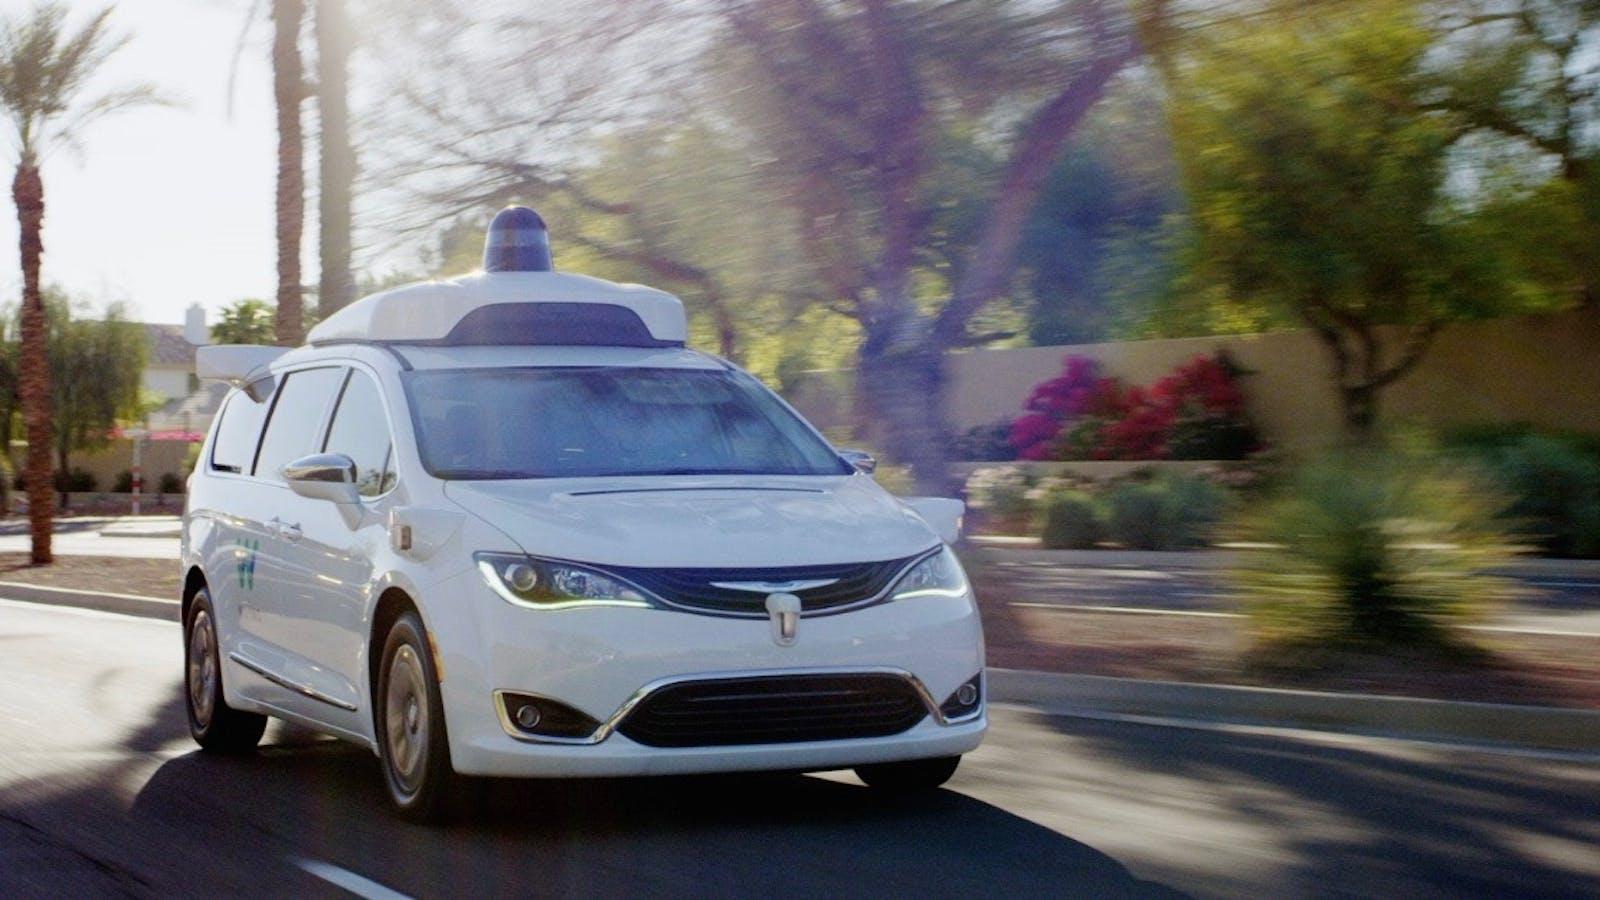 A Waymo self-driving van in Chandler, Ariz. Photo: Waymo